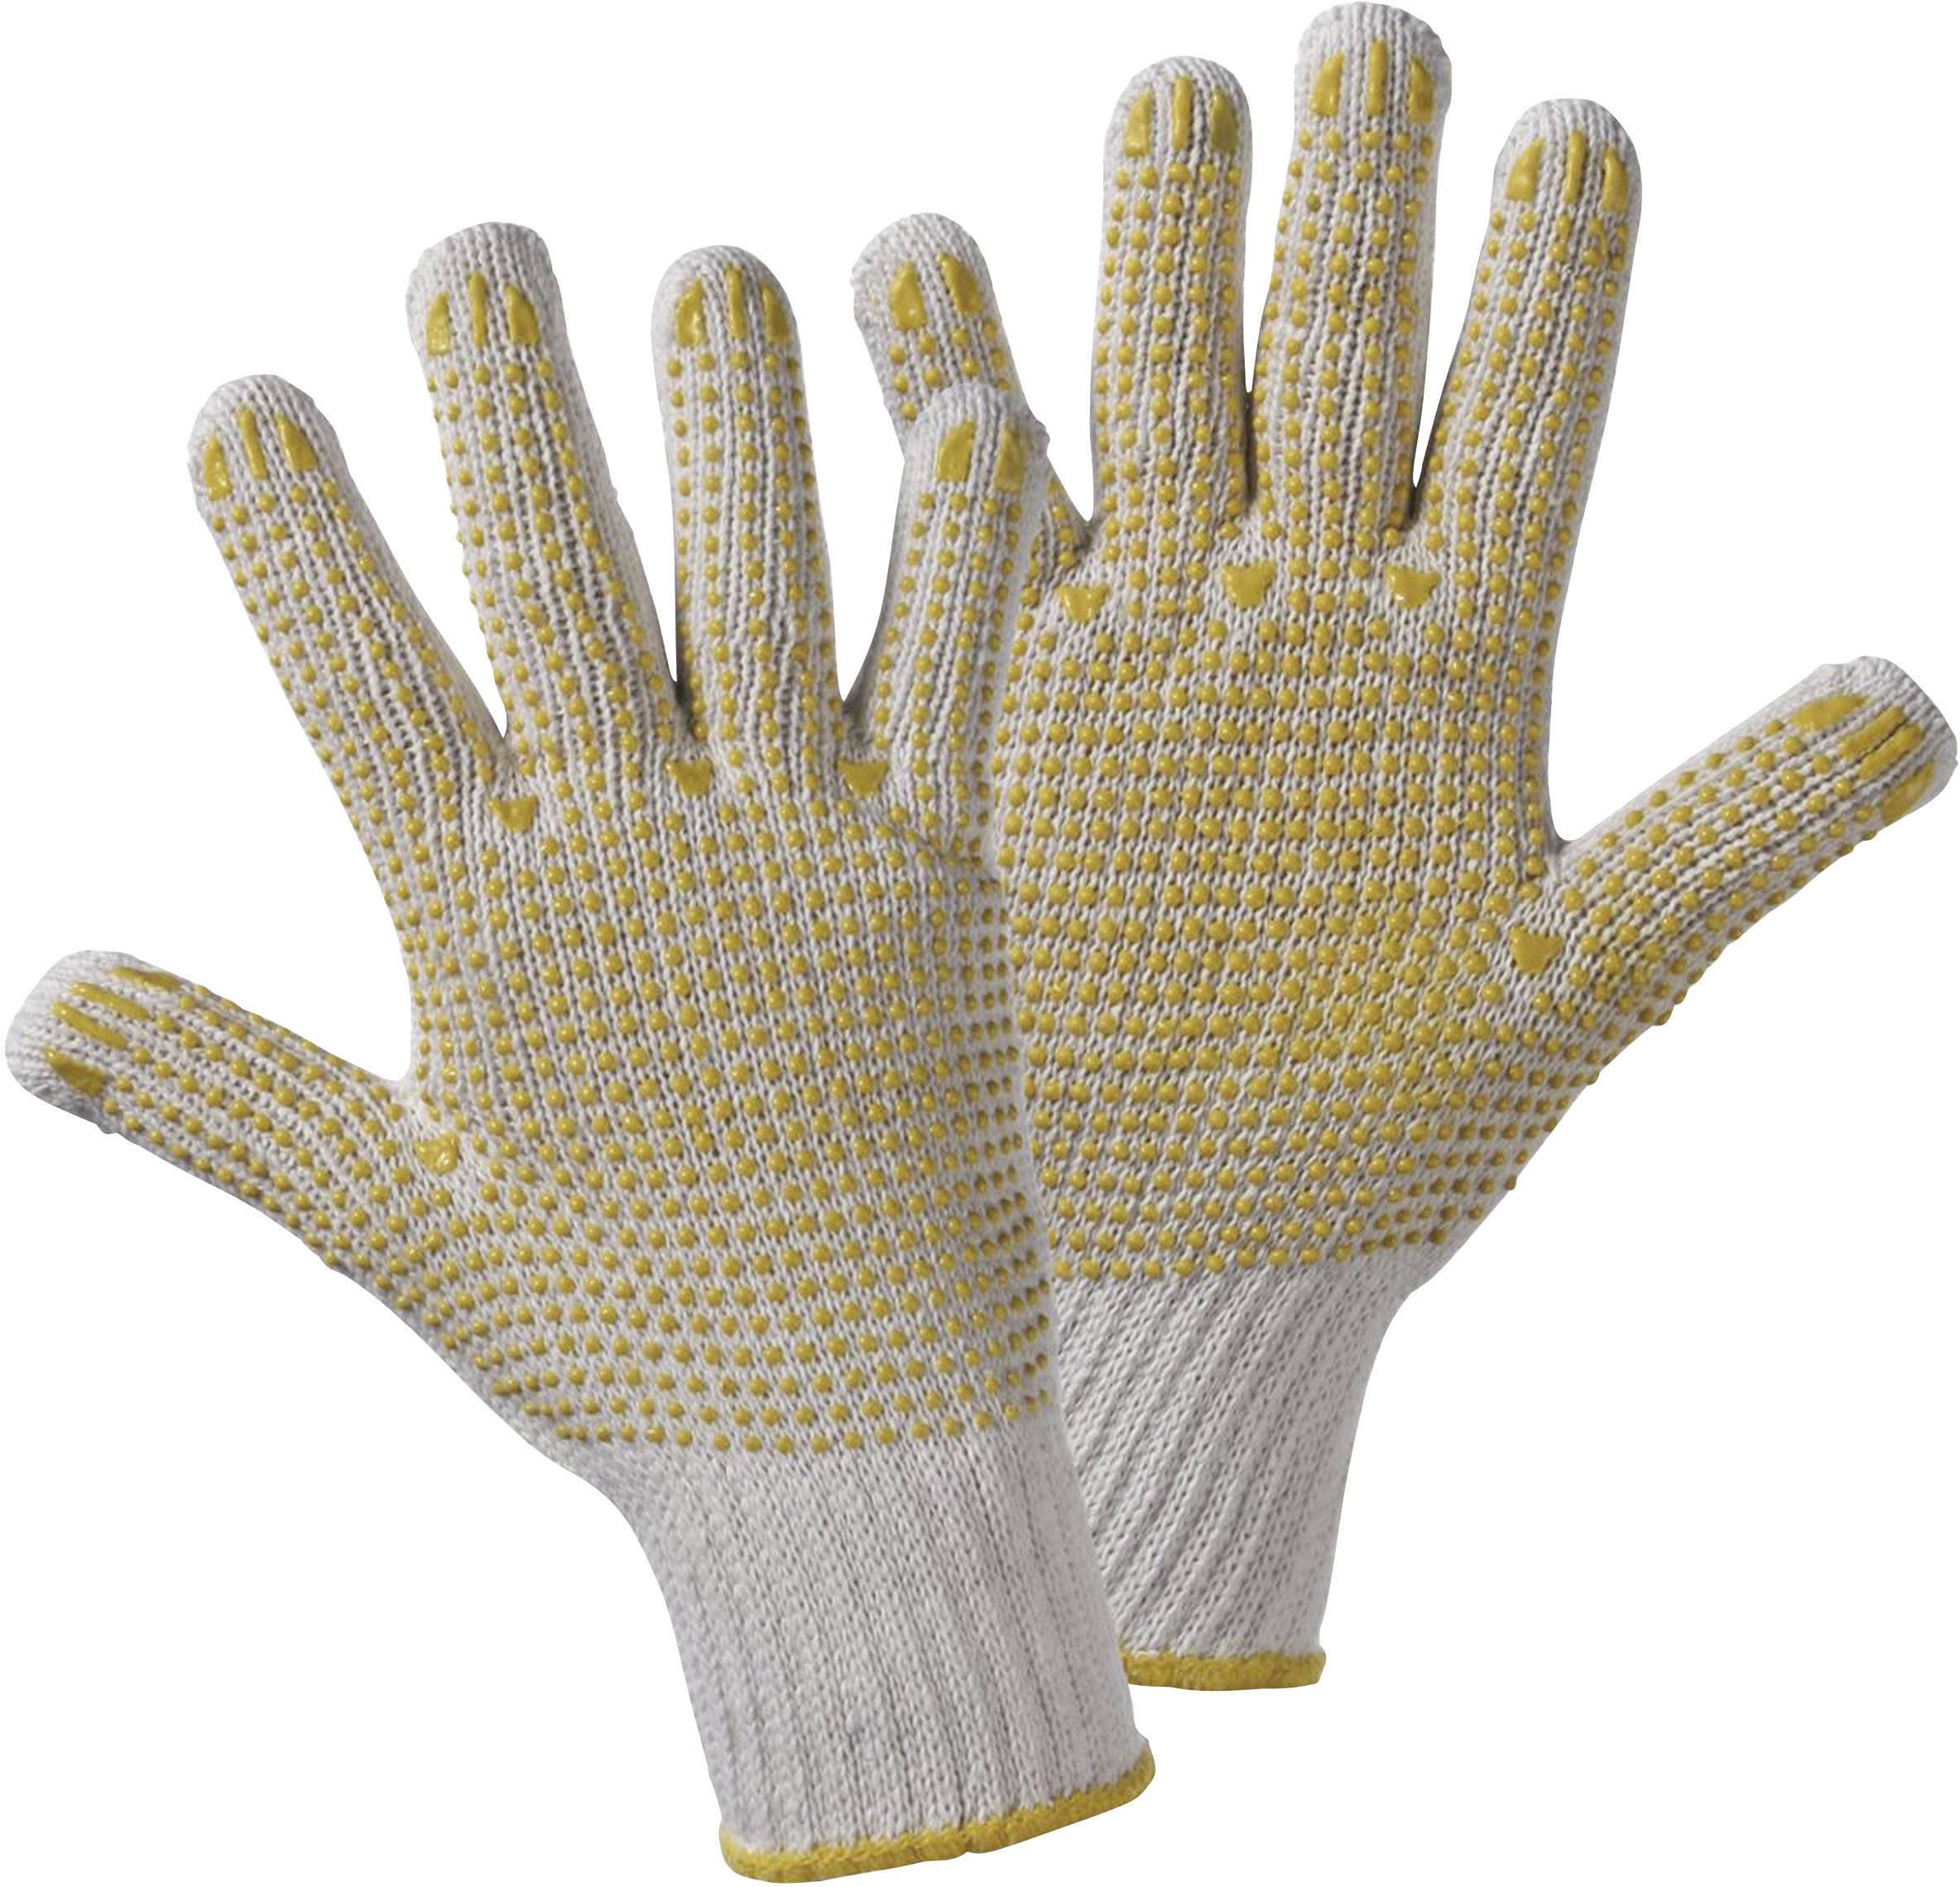 Pracovné rukavice Upixx Twice 1132, velikost rukavic: 10, XL